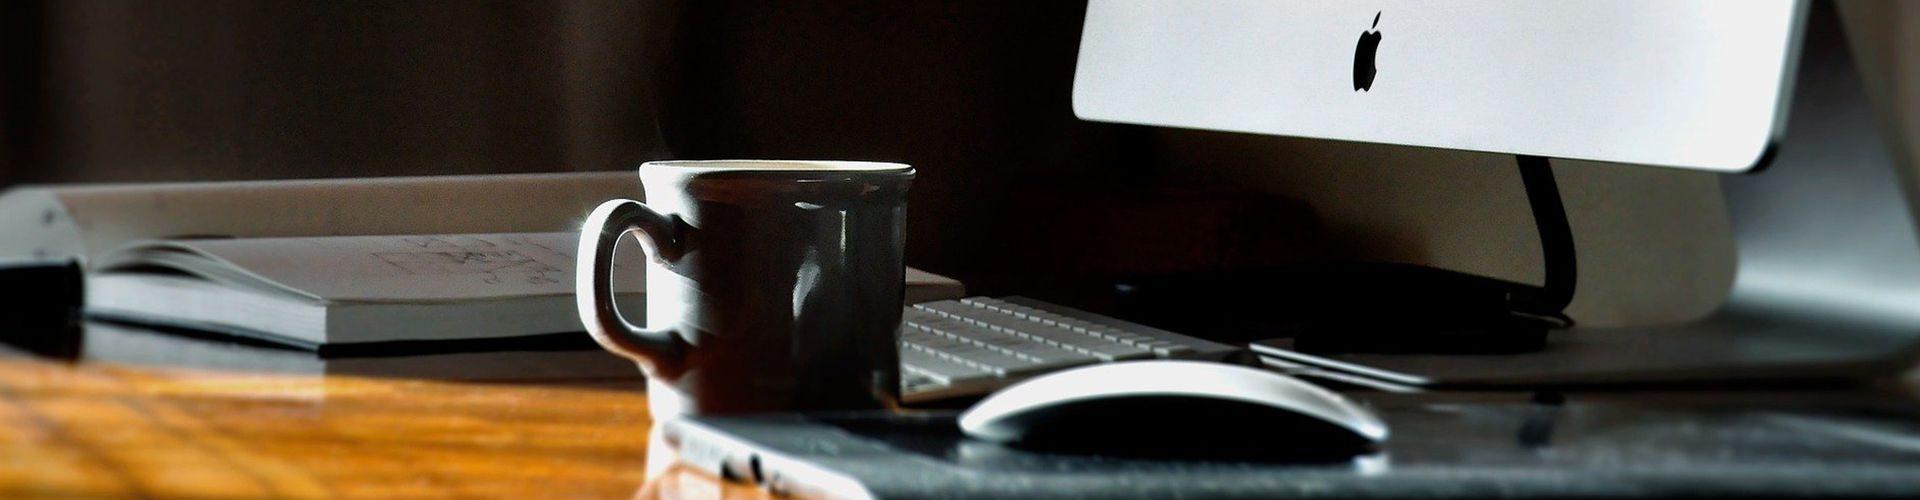 imagen representativa de dseño web wordpress